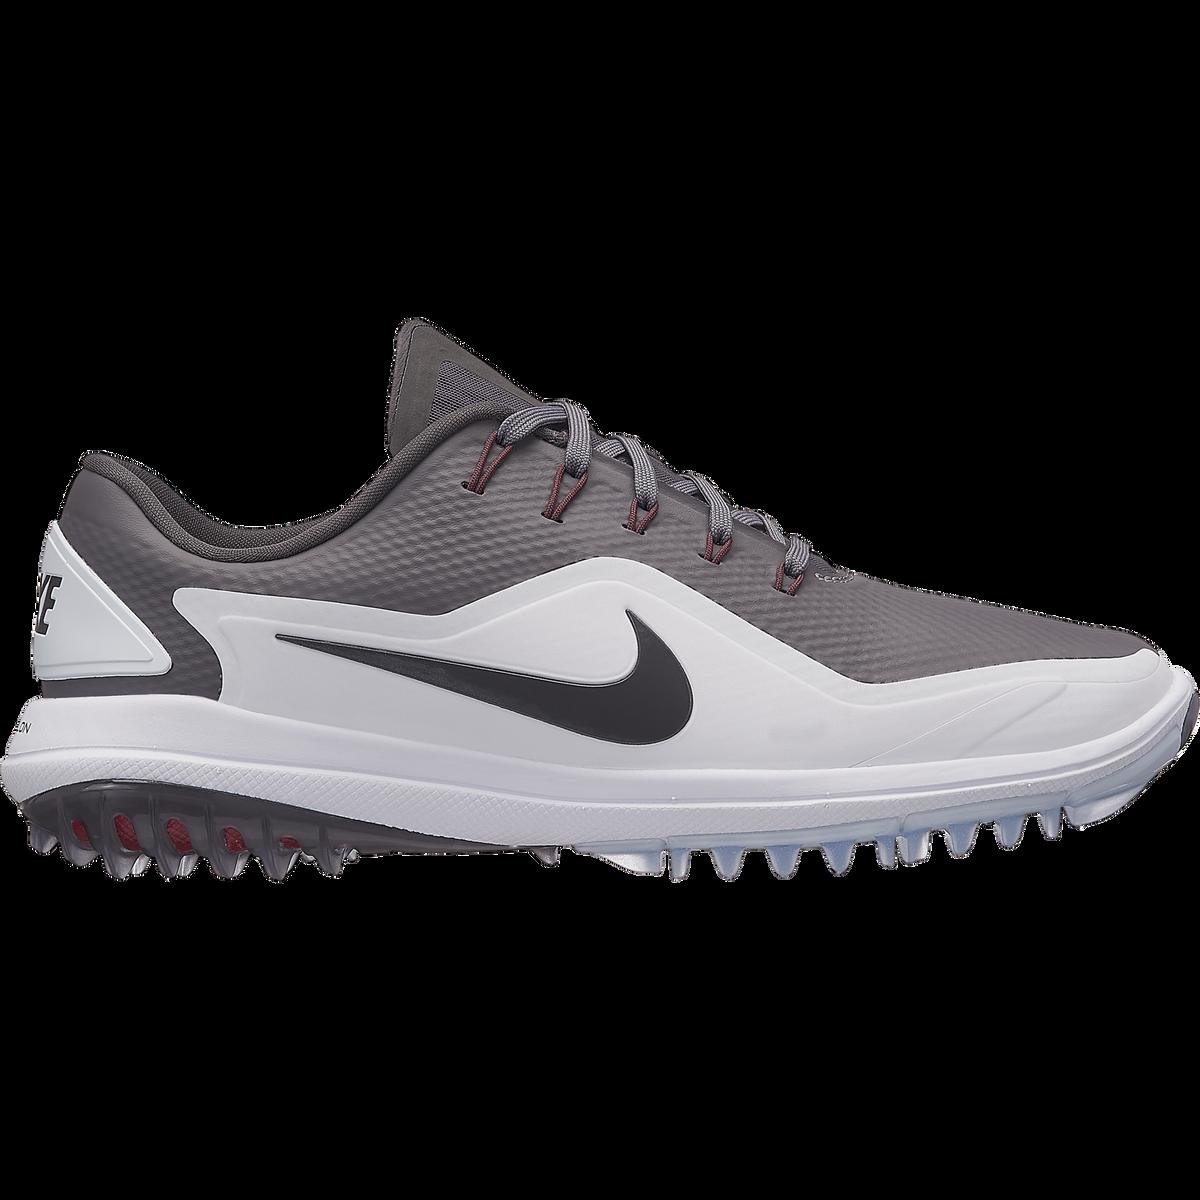 Nike Lunar Control Vapor 2 Men s Golf Shoe - White Grey 4917486e556